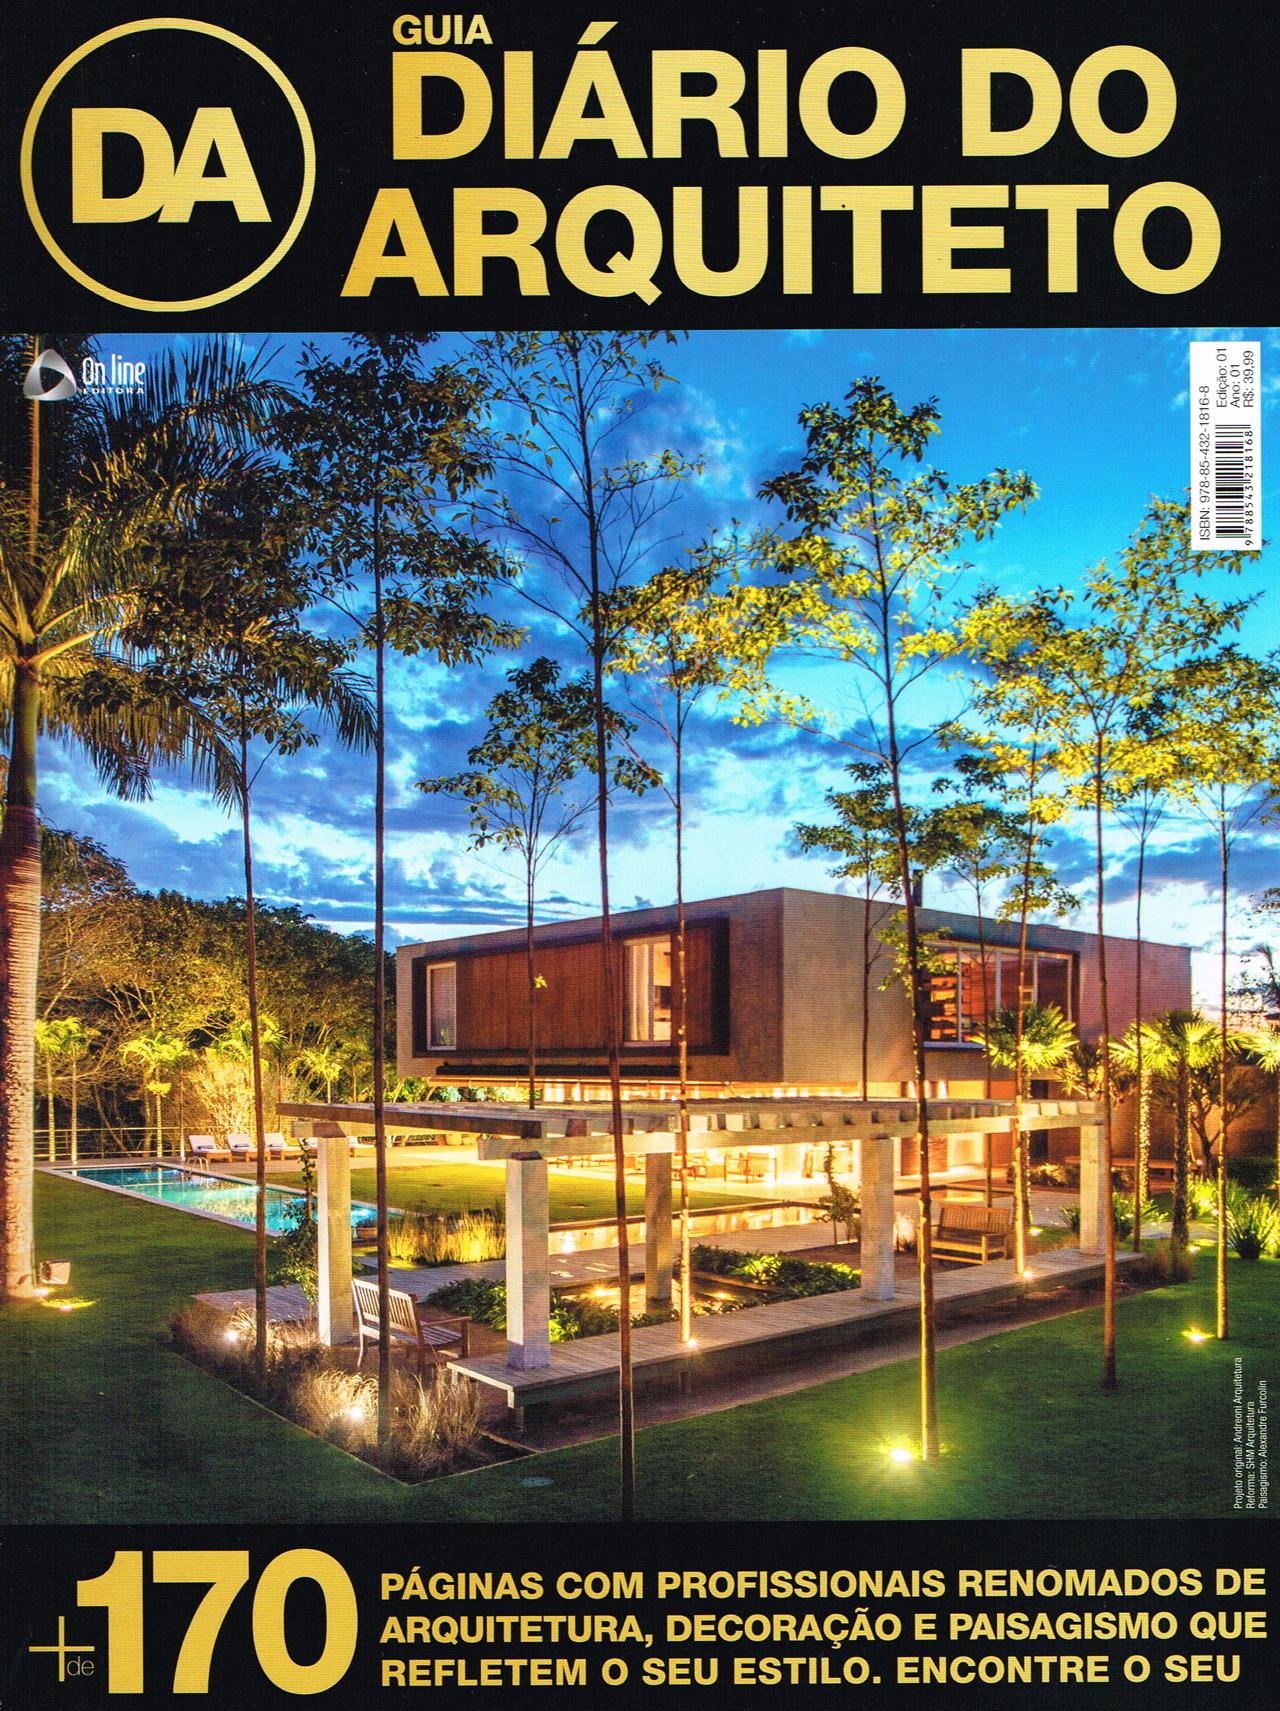 diario-do-arquiteto-capa